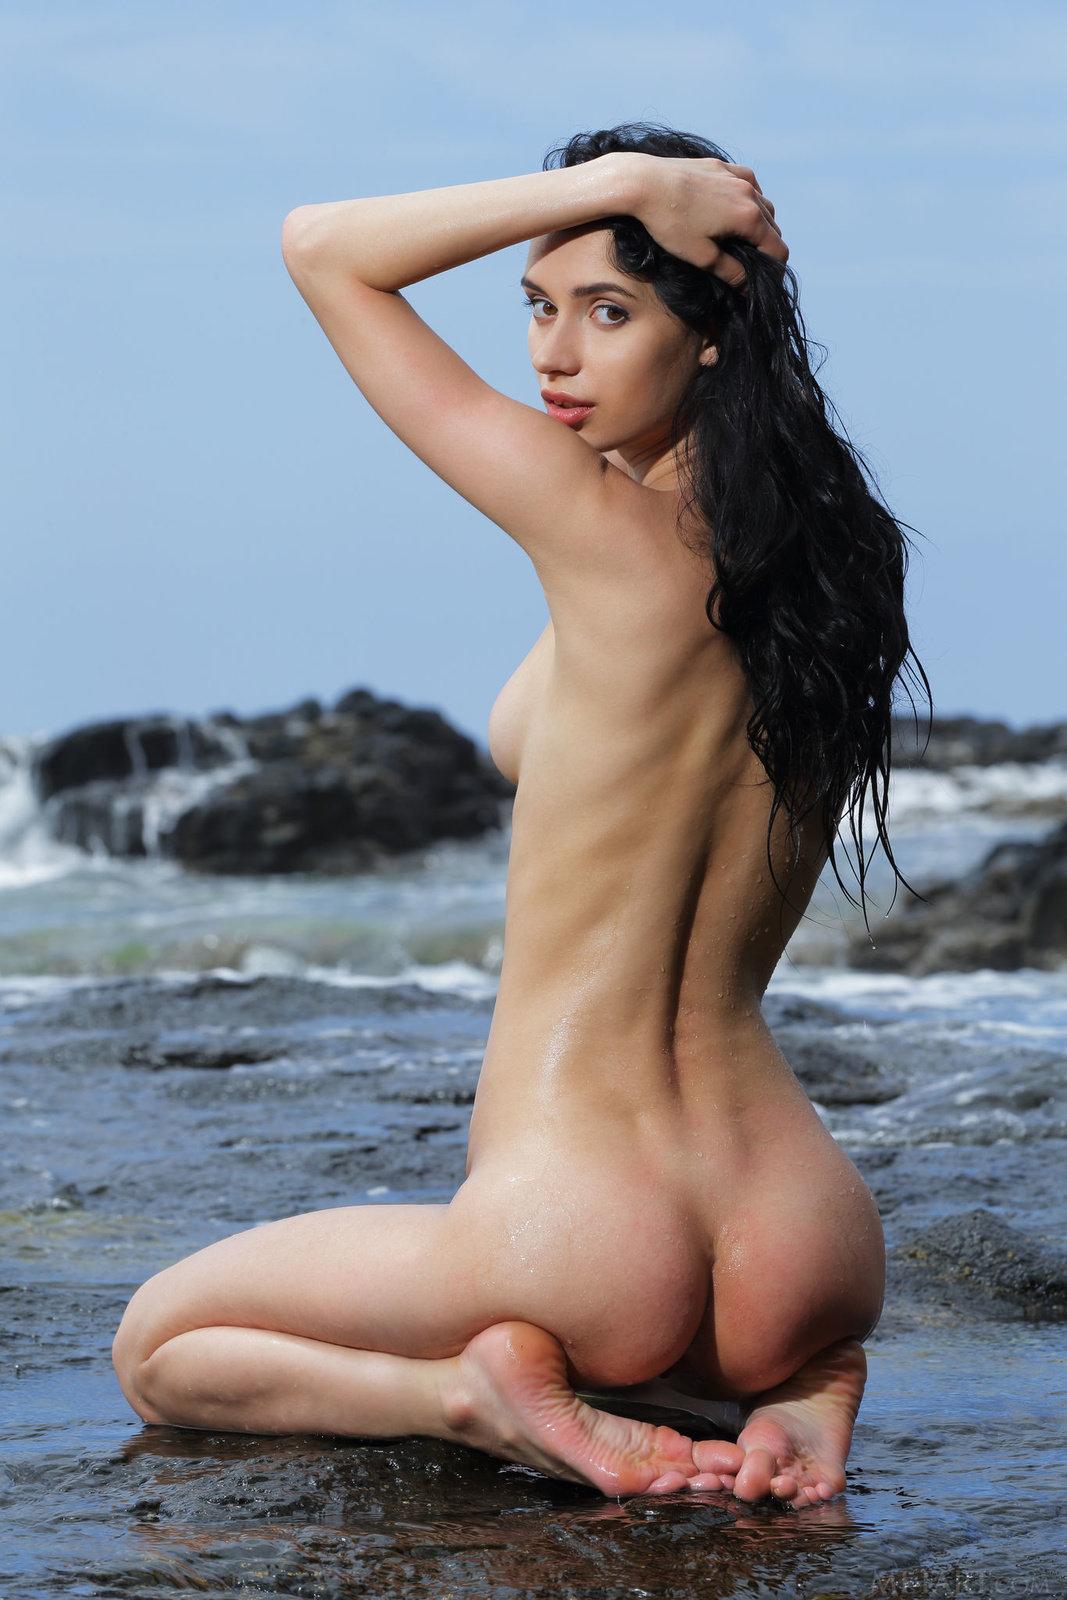 Choli nude dita rose naked patrick butt